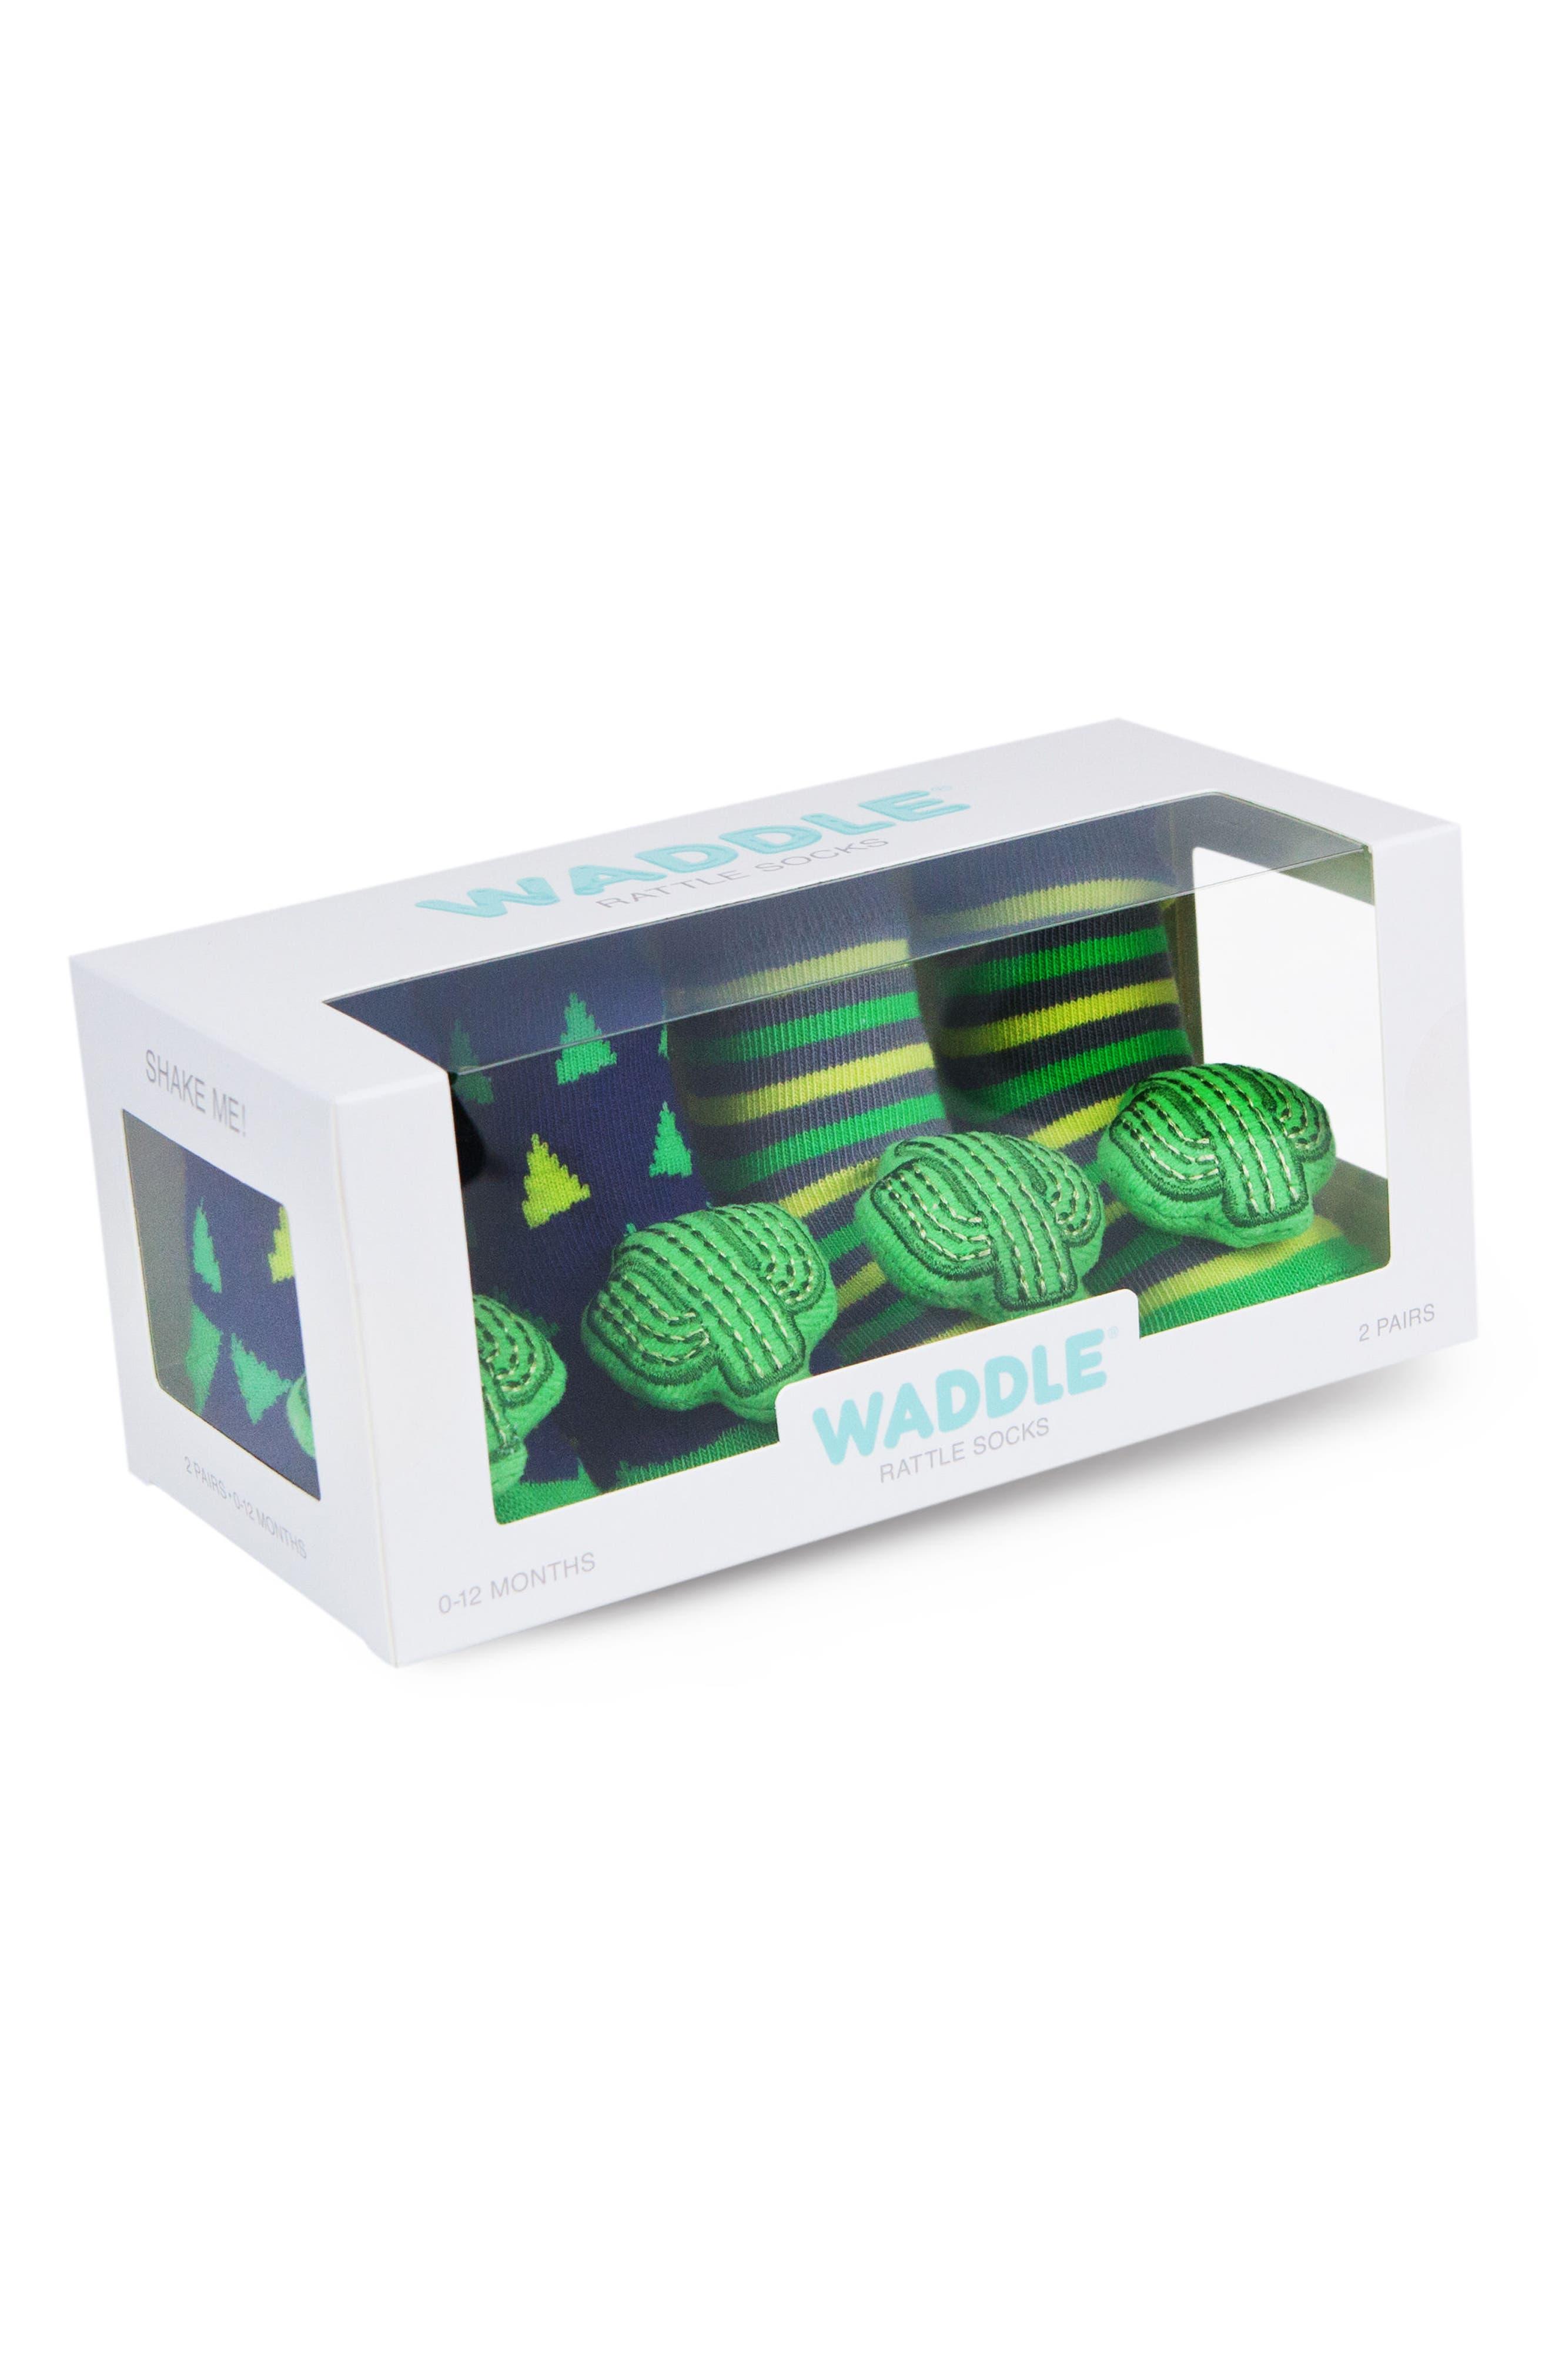 Cactus 2-Pack Rattle Socks,                             Alternate thumbnail 2, color,                             440